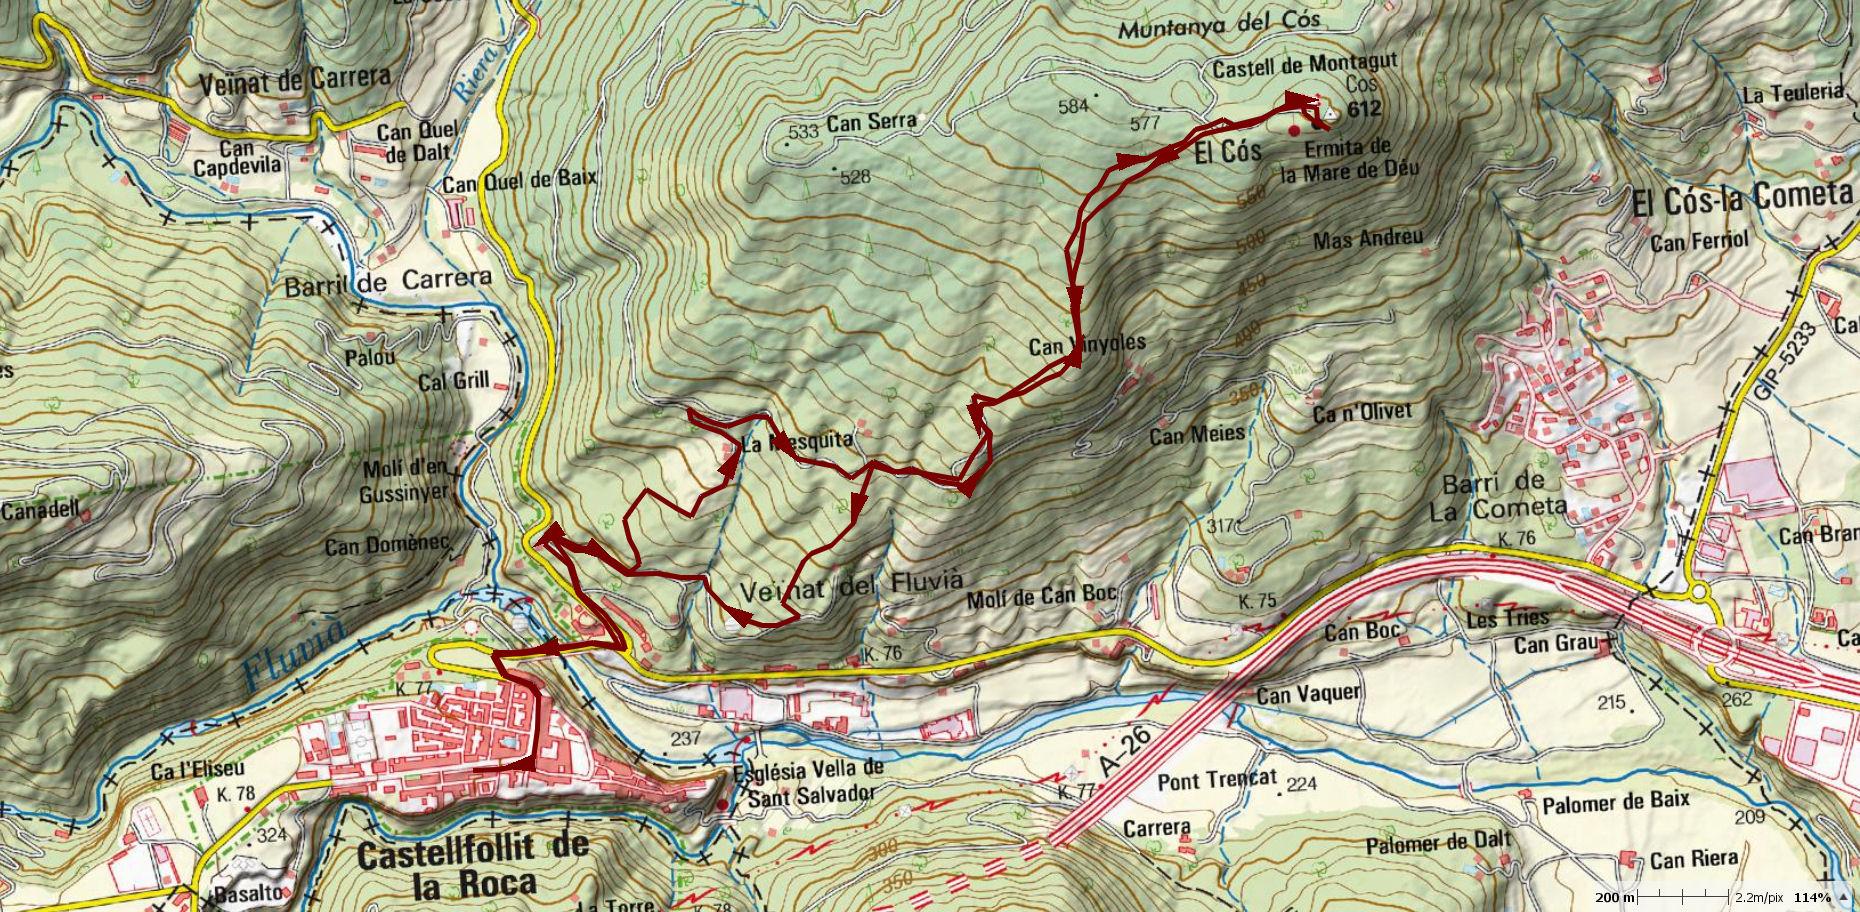 CASTELLFOLLIT-CASTELL-DE-MONTAGUT-MAP